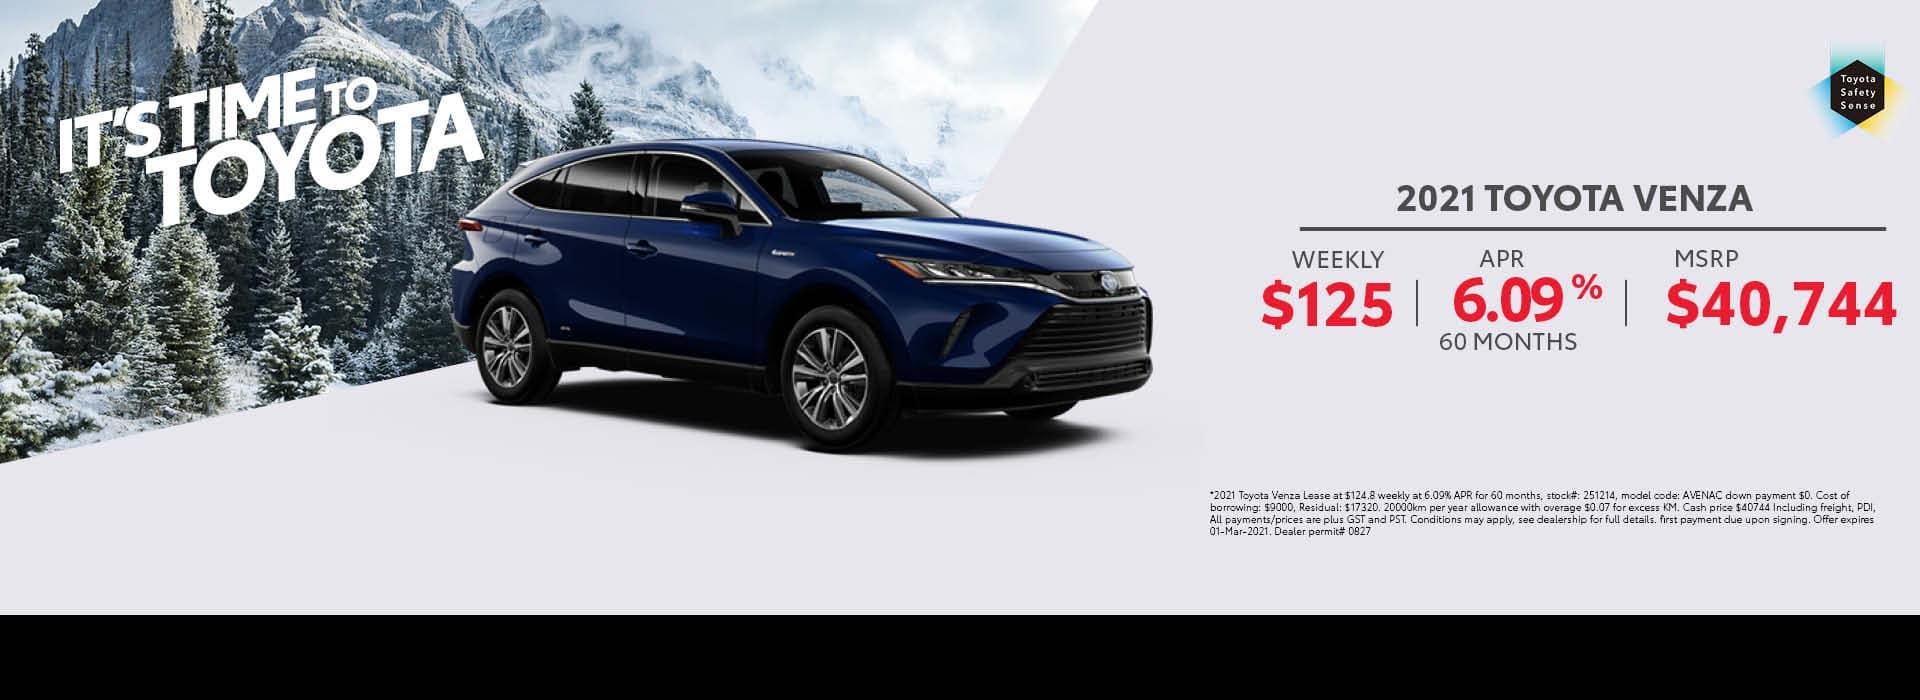 2021_Toyota_Venza_Desktop_Home_Page_Banner_Feb202112